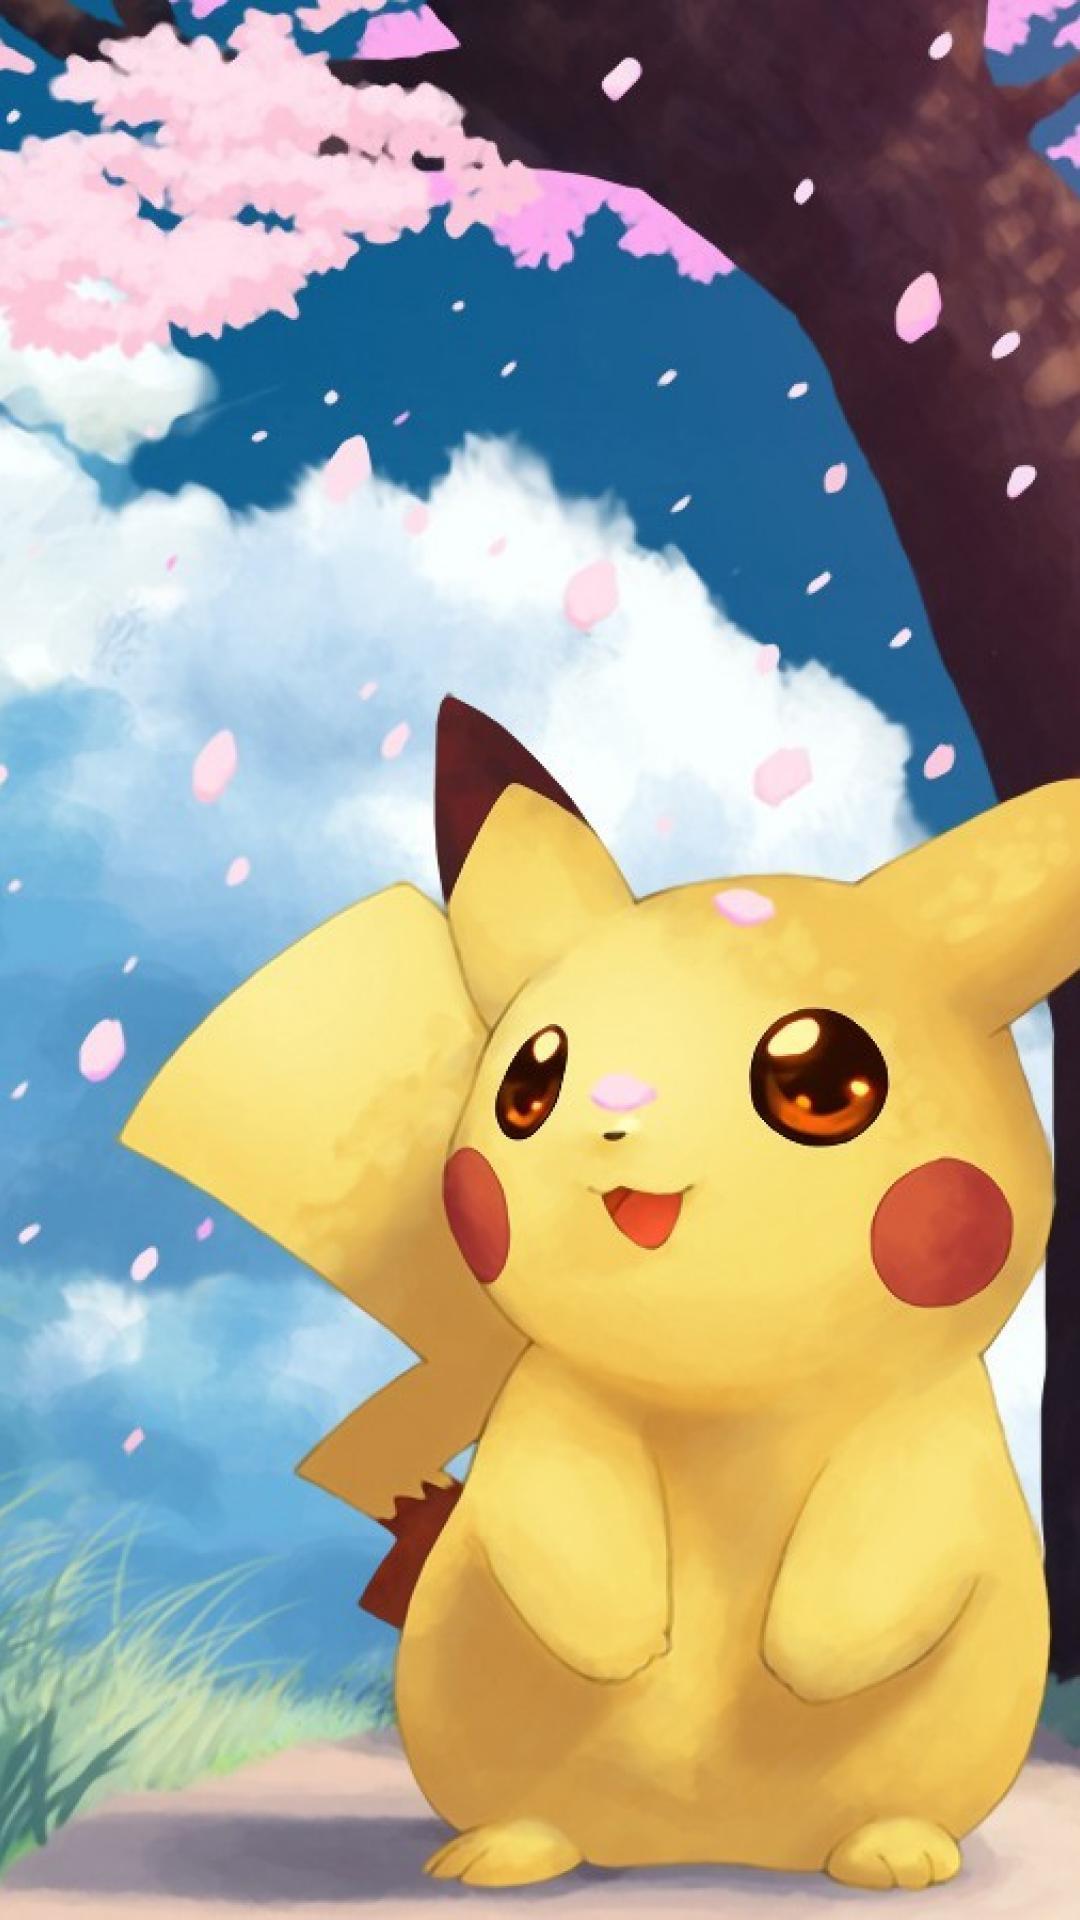 Cute Pokemon Wallpapers Pikachu - Wallpaper Cave